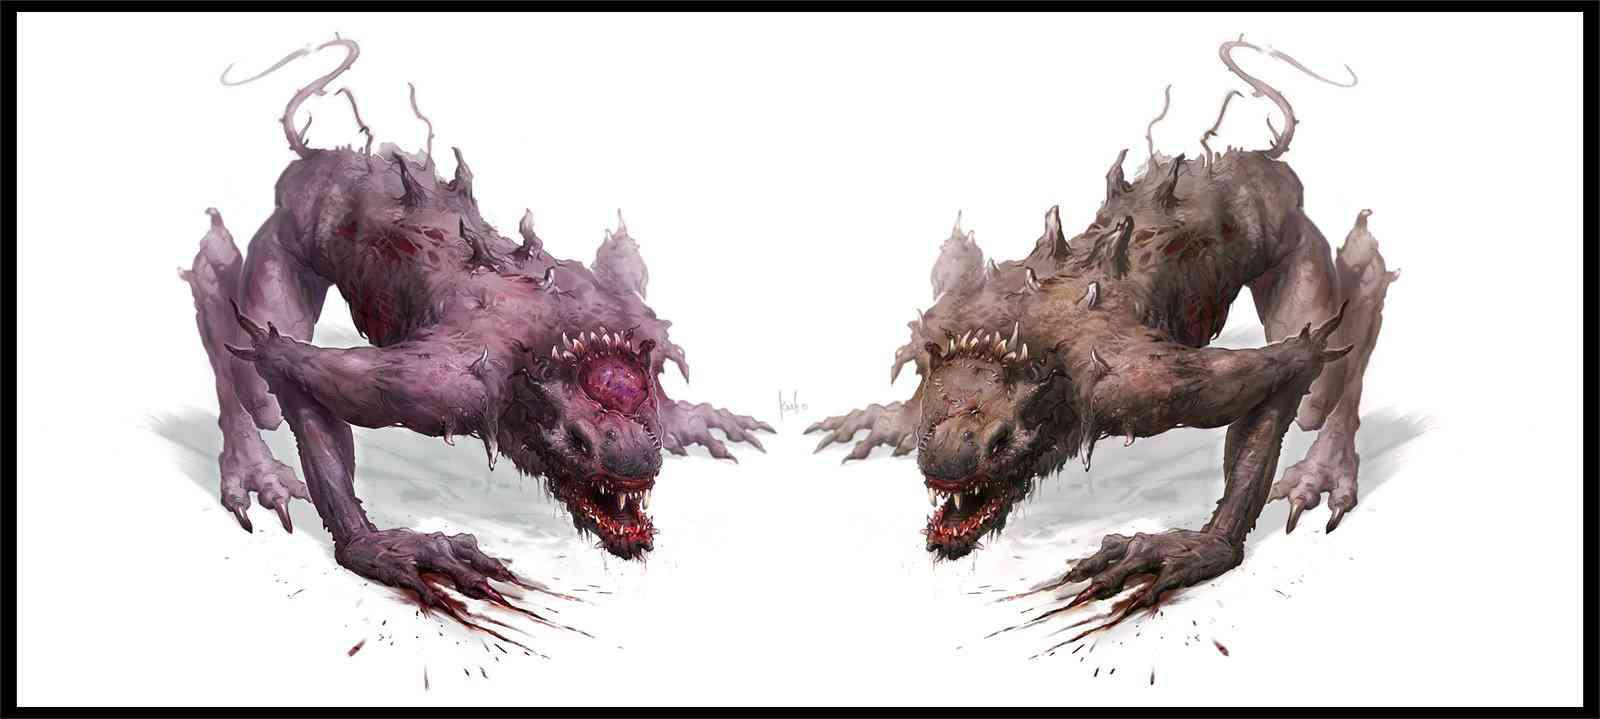 Dead eater by kash  Ultra gump blaster mega pack ultimate post de monstros 4